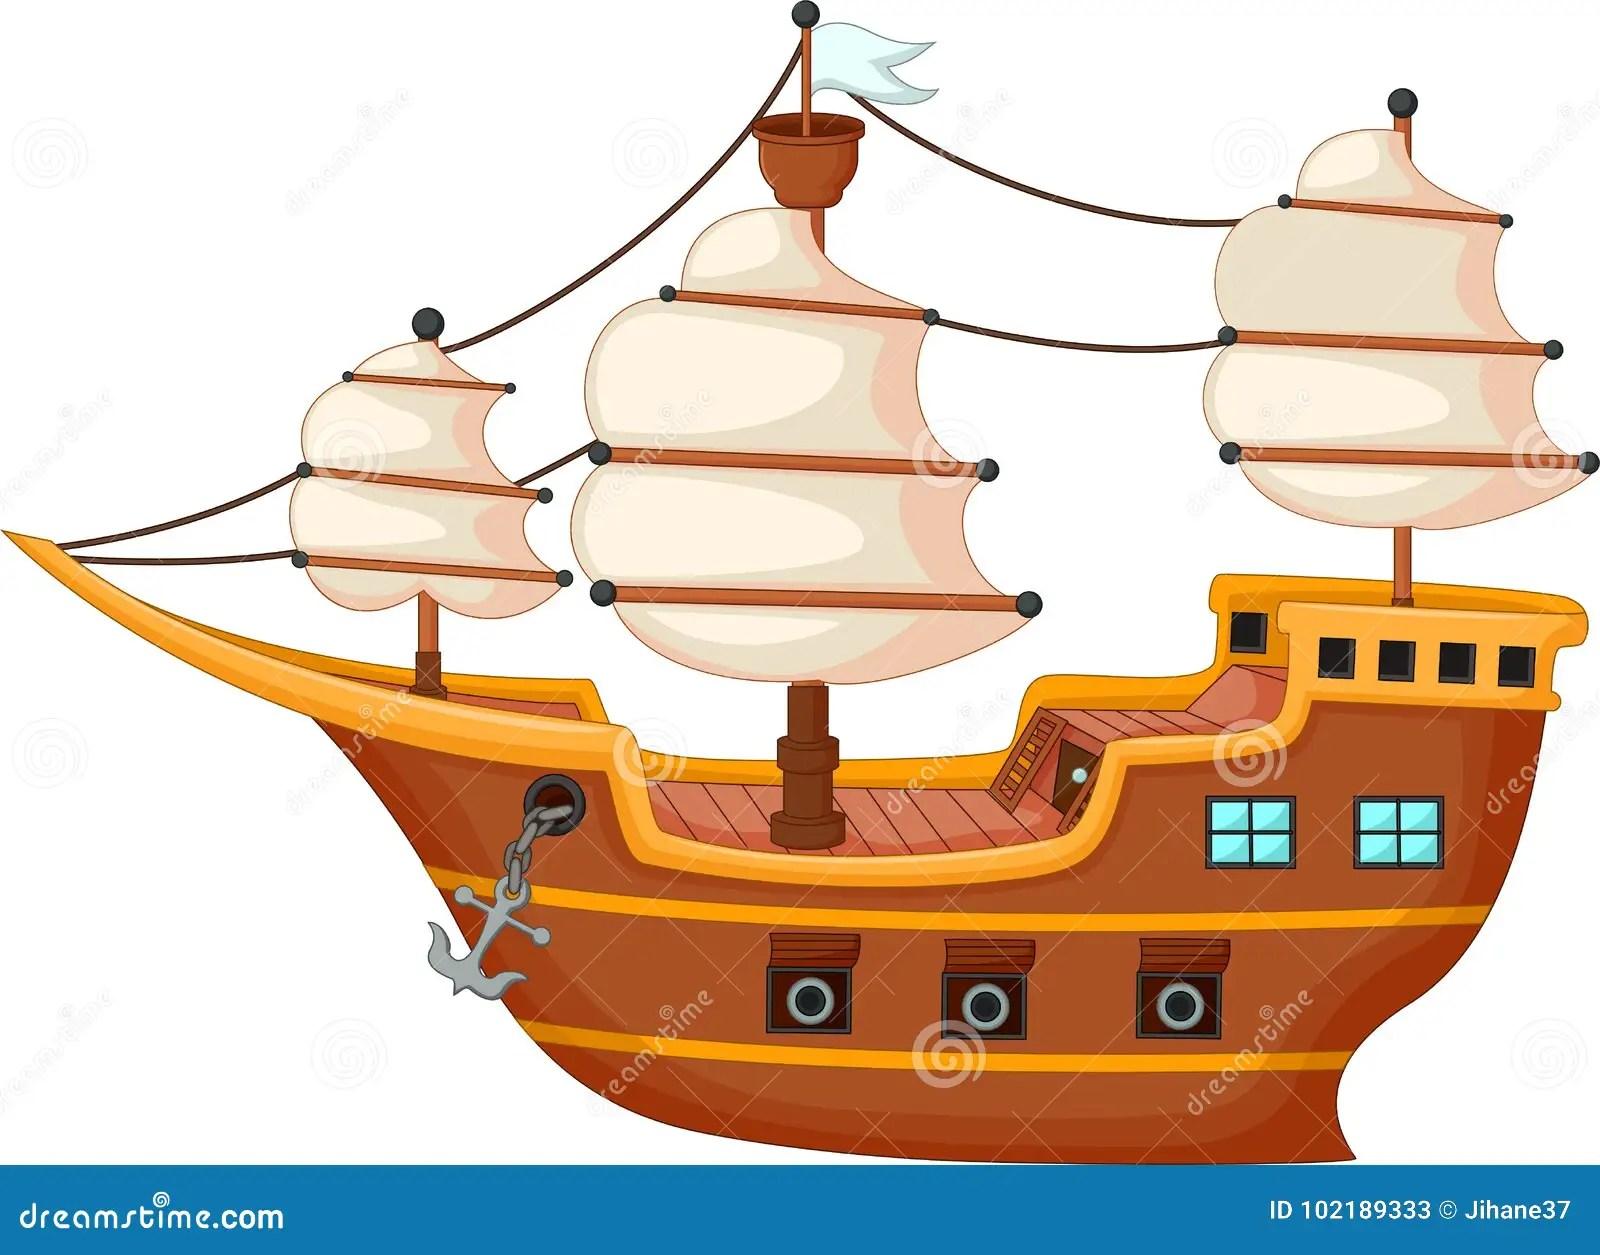 Cartoon Yacht Vector Illustration